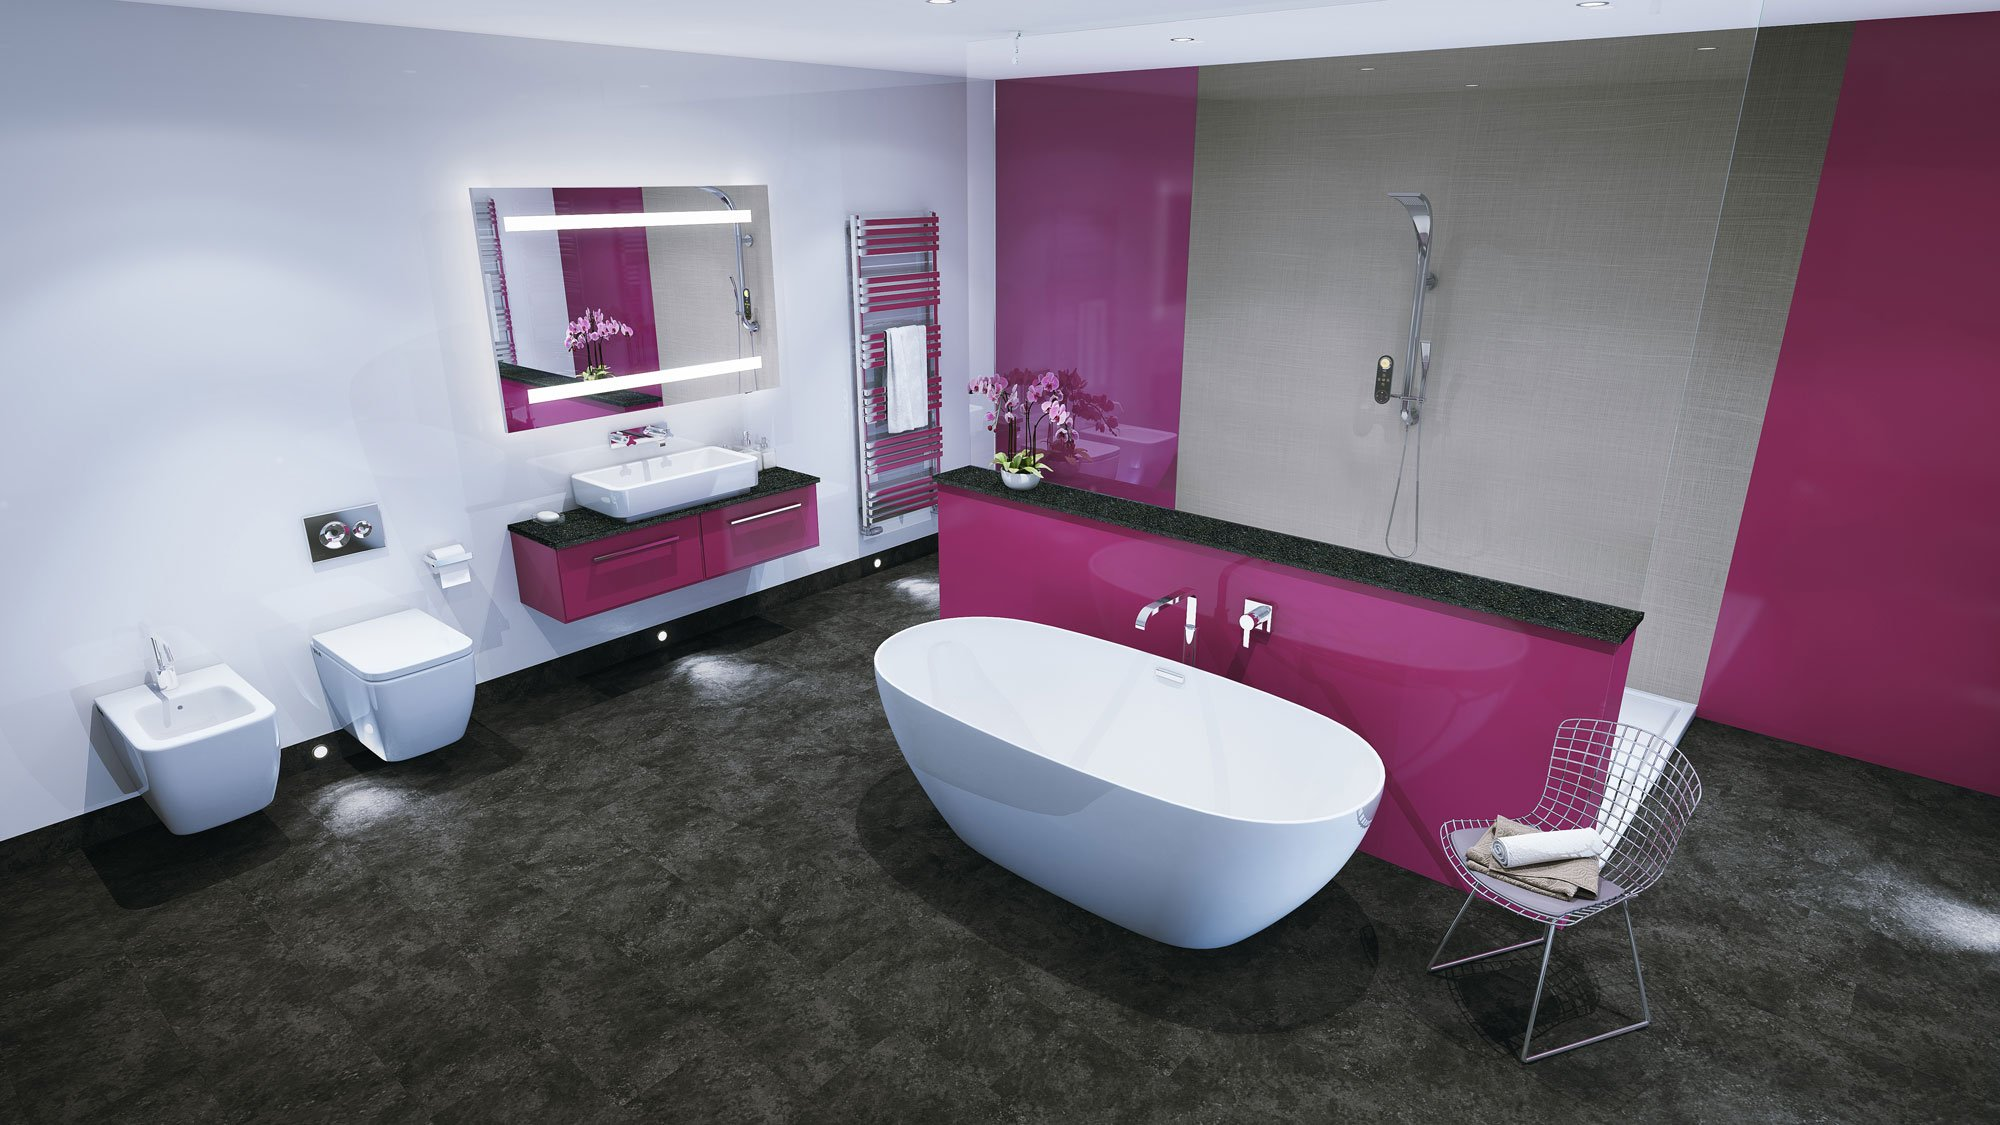 Ванная с пластиковыми панелями в стиле модерн